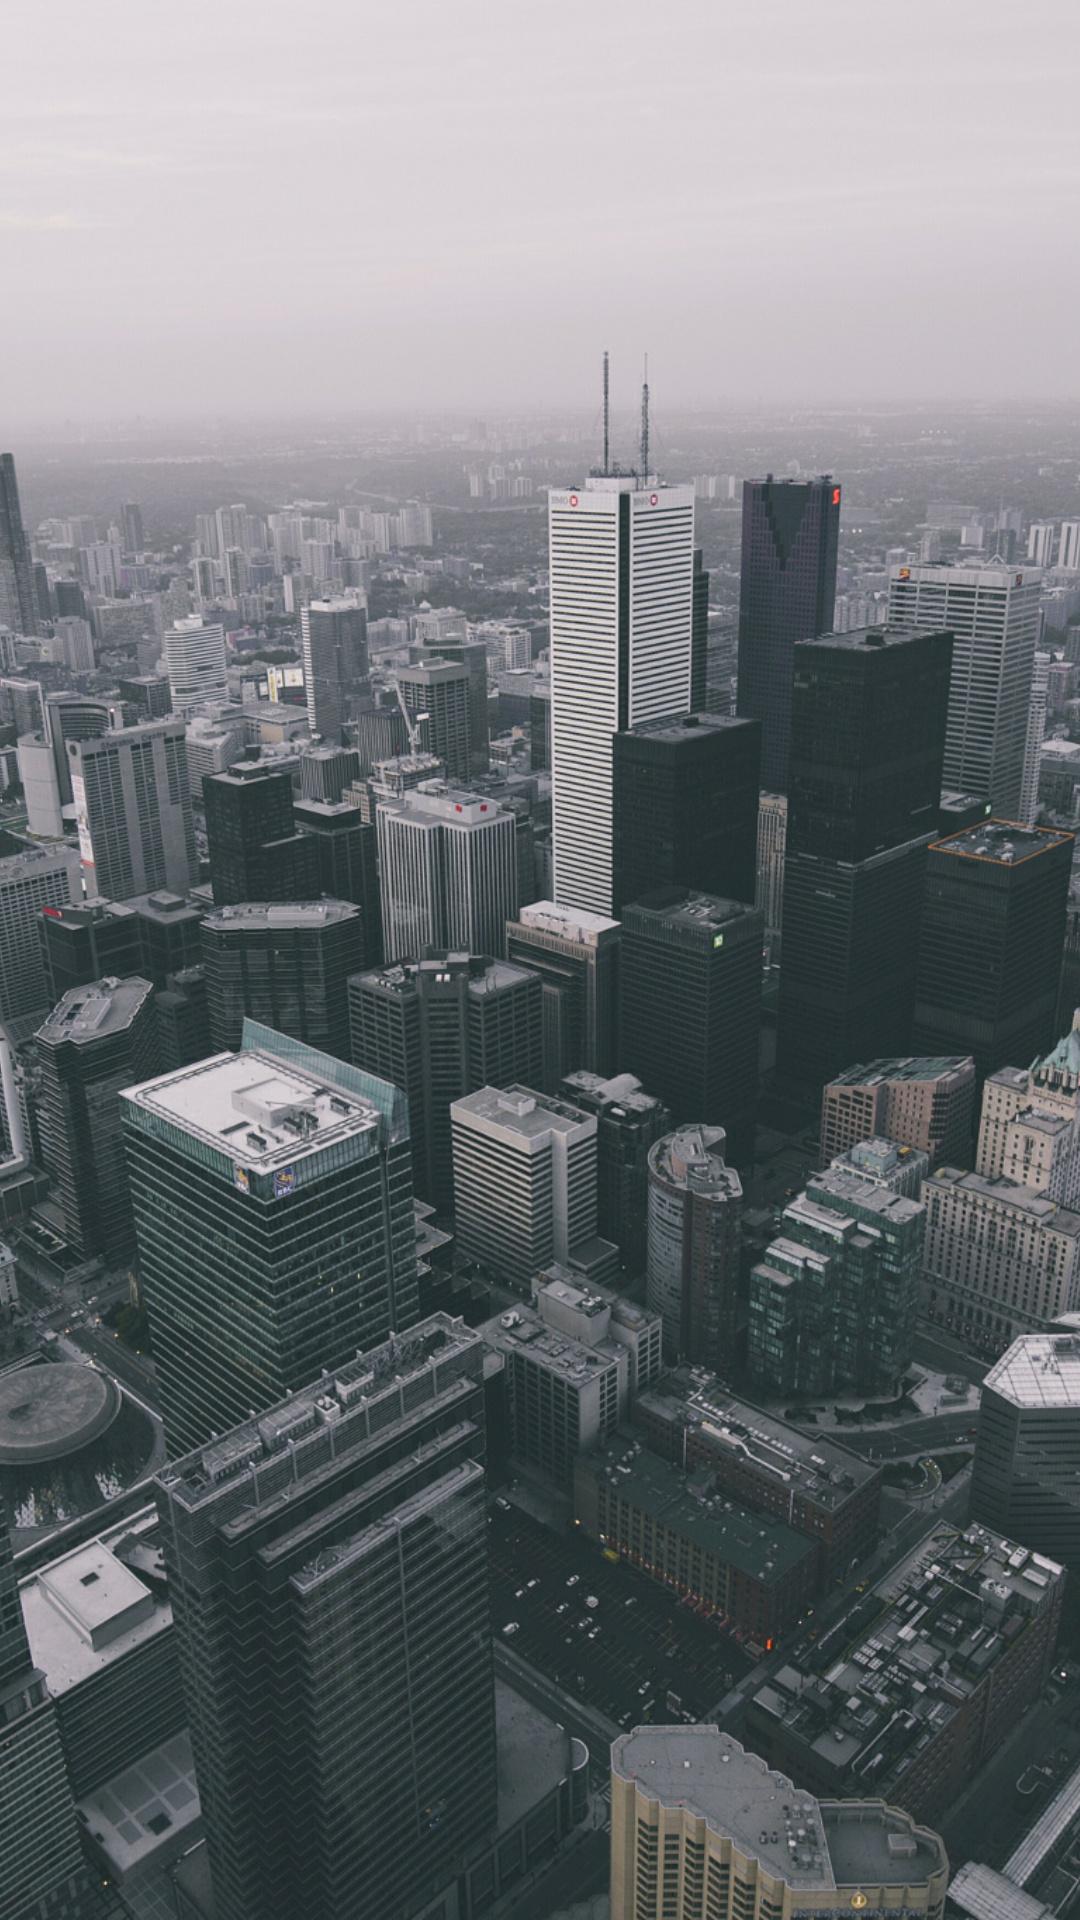 iPhone wallpaper city buildings City